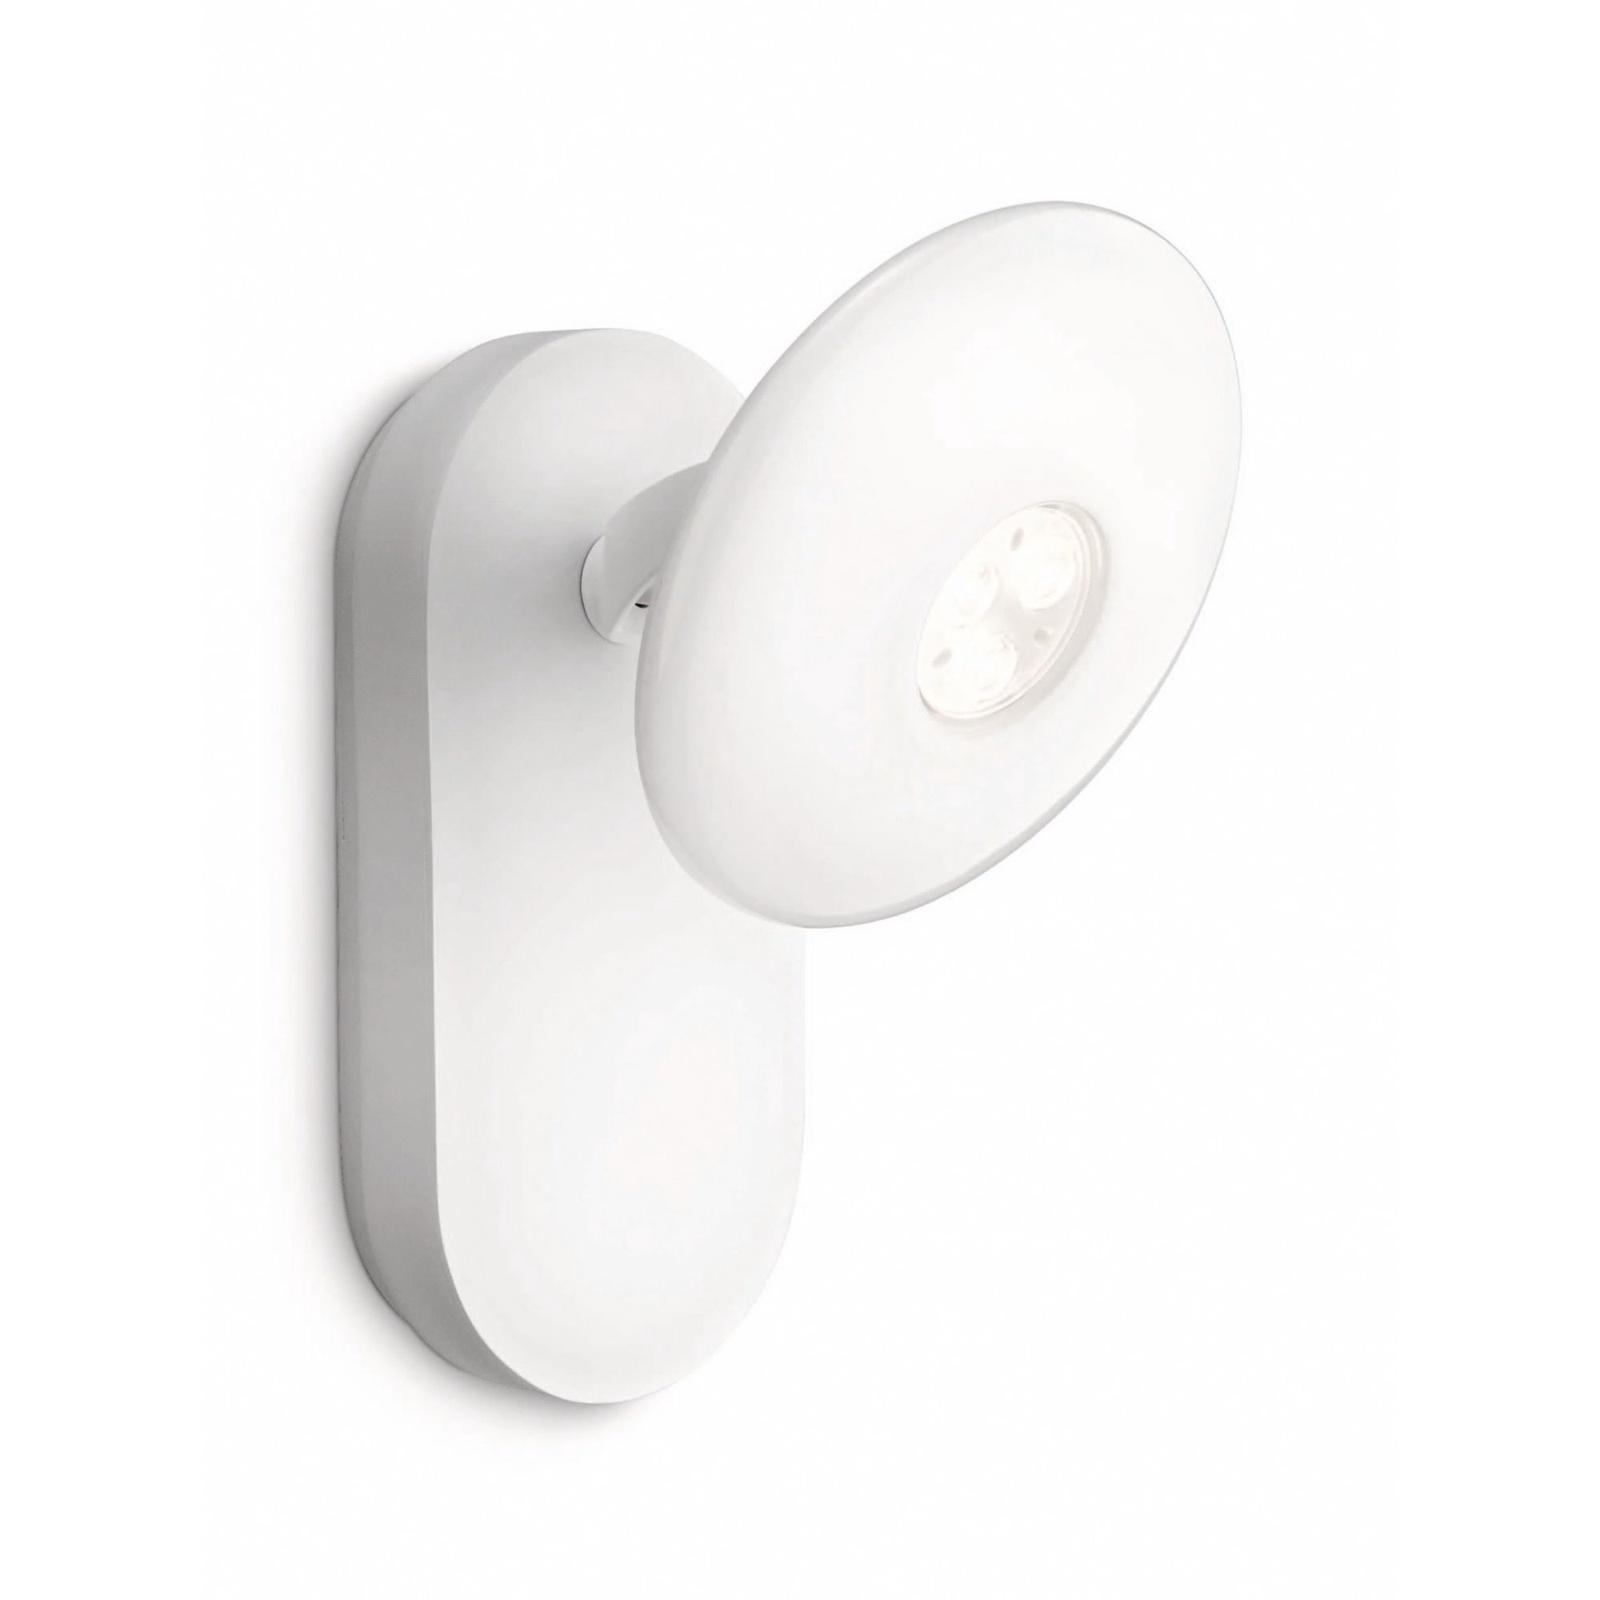 Настенный светильник Philips 53140/31/16, LED, 7,5 Вт цена